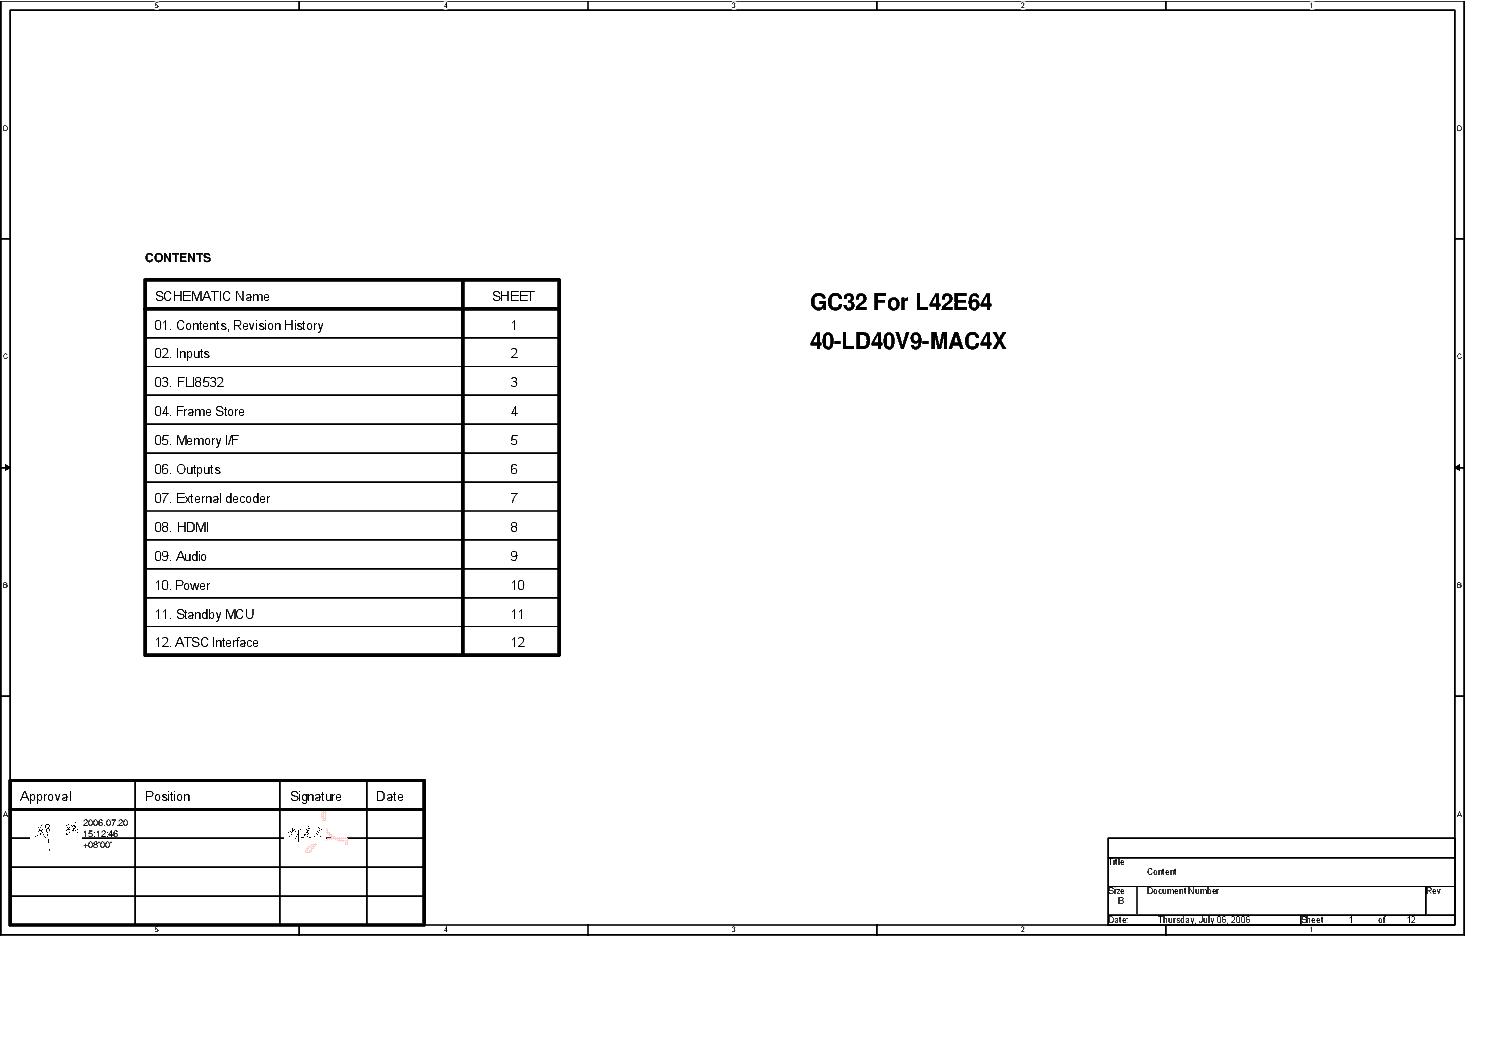 TCL L42E64 40-LD40V9-MAC4X MAIN SCH Service Manual